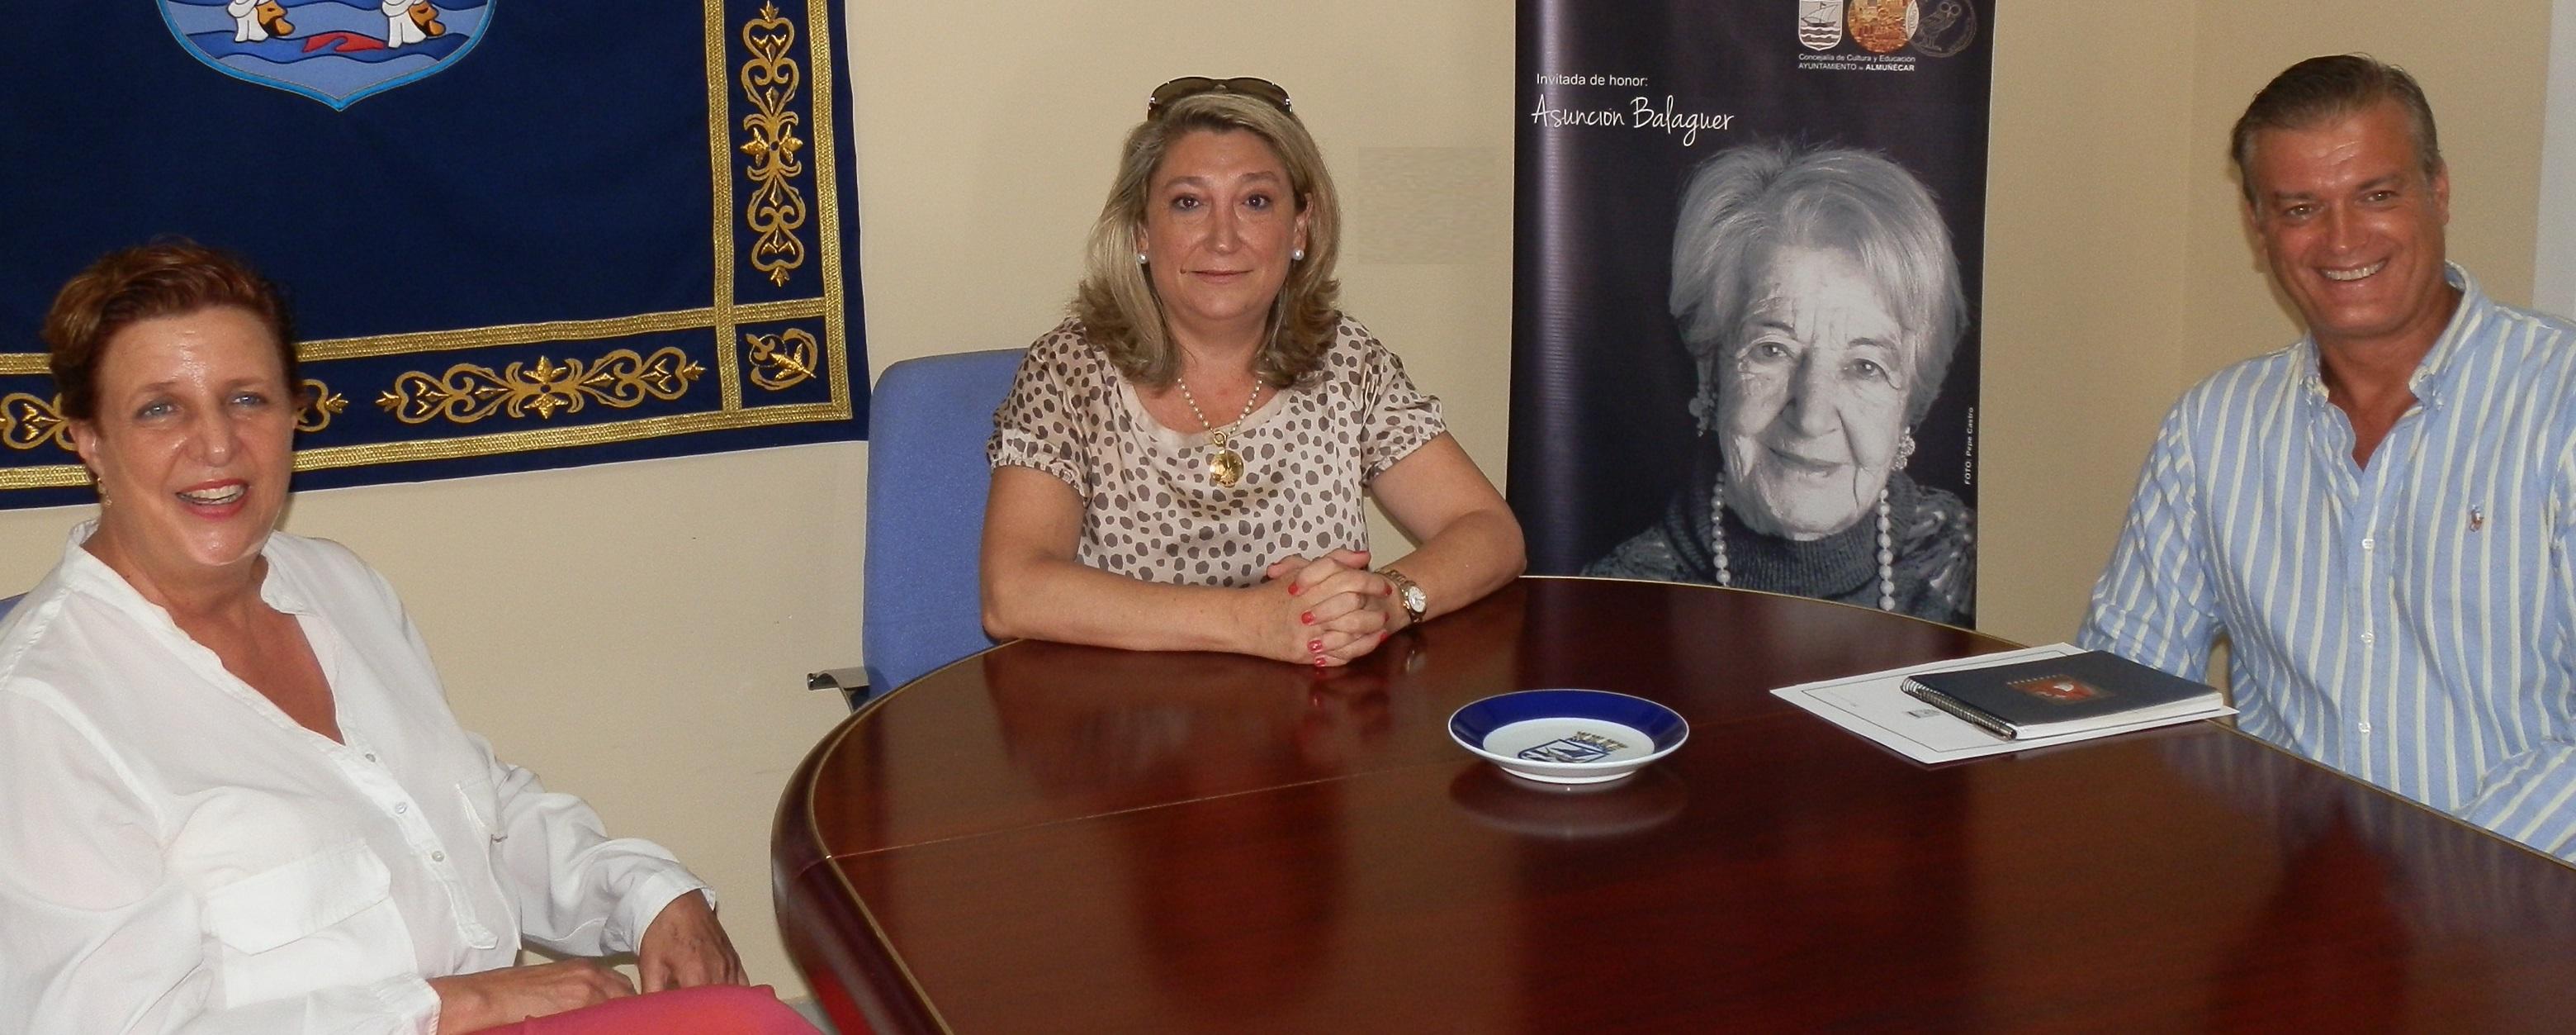 Ruano felicita a gaizka urresti por el goya logrado por for Oficina empleo goya